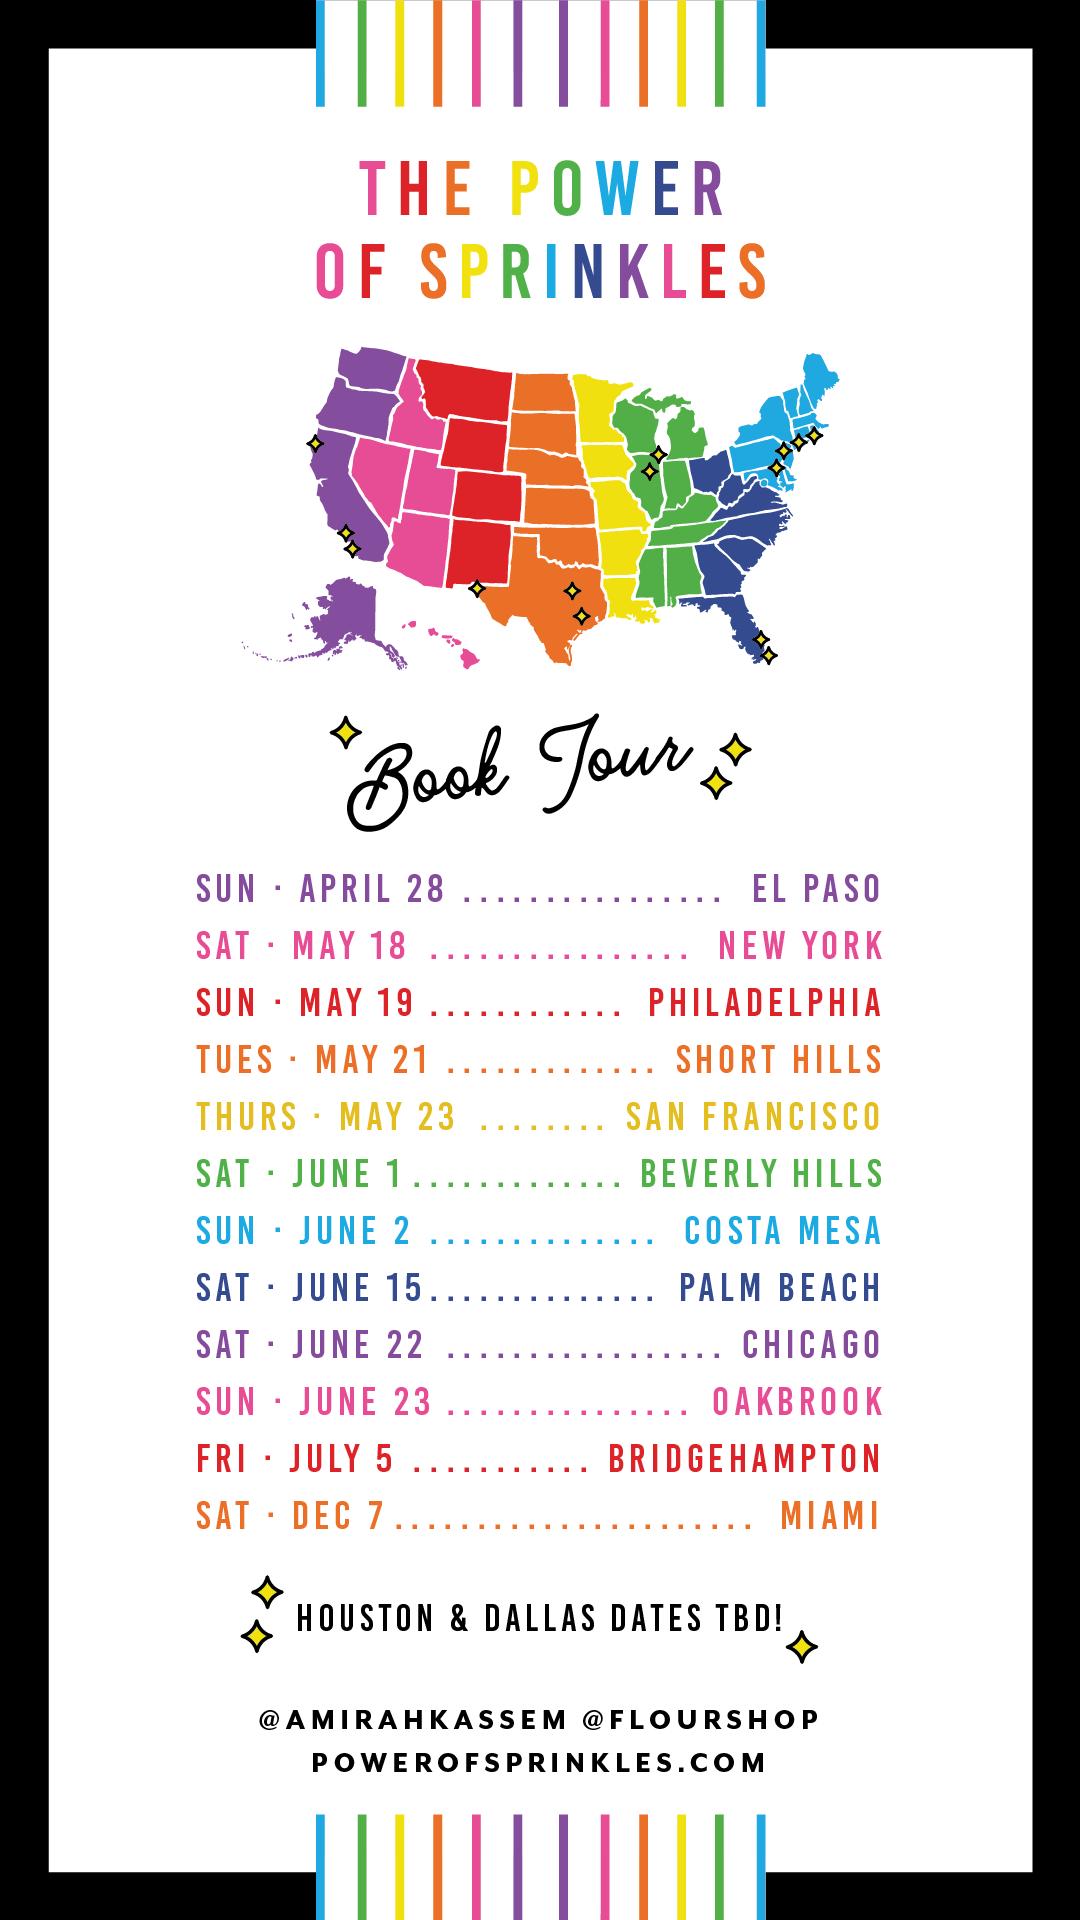 Power of Sprinkles Book Tour!